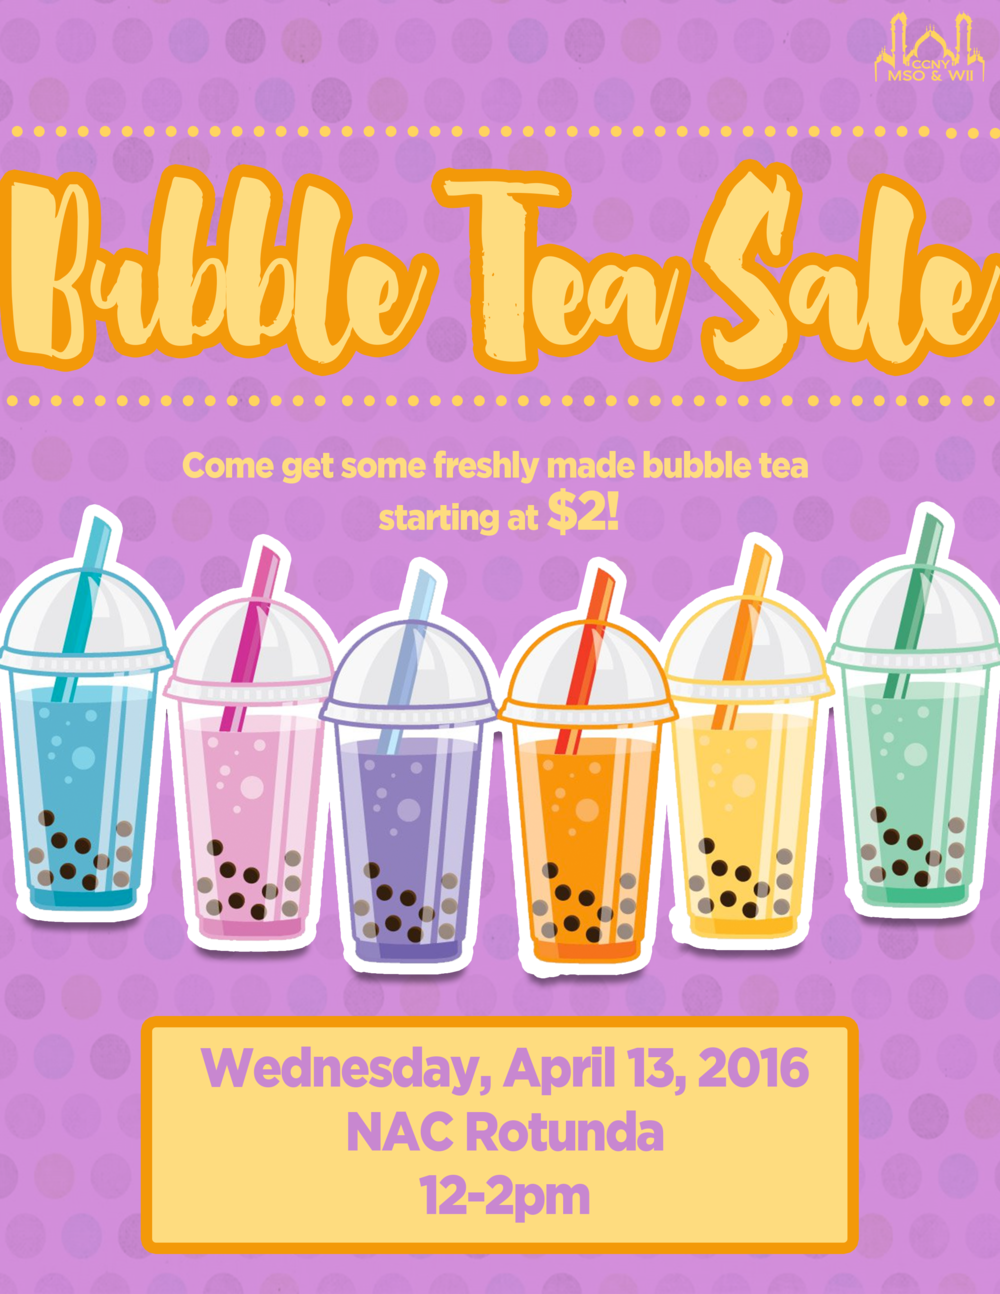 IAW 2016 Bubble Tea Flyer.png